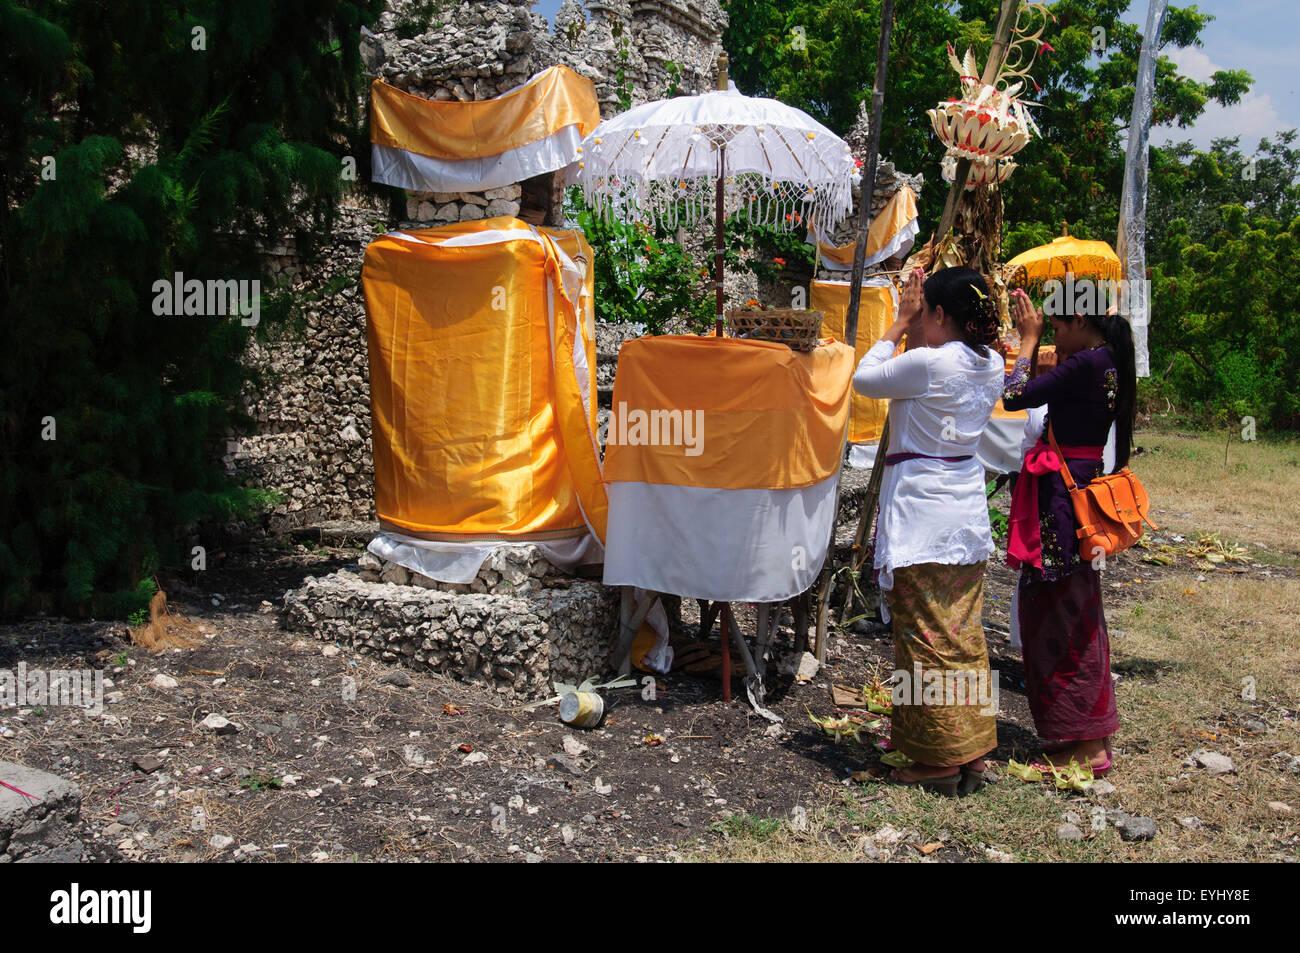 Two women praying at a Hindu Temple at the island of Menjangan in West Bali National Park, Bali, Indonesia - Stock Image